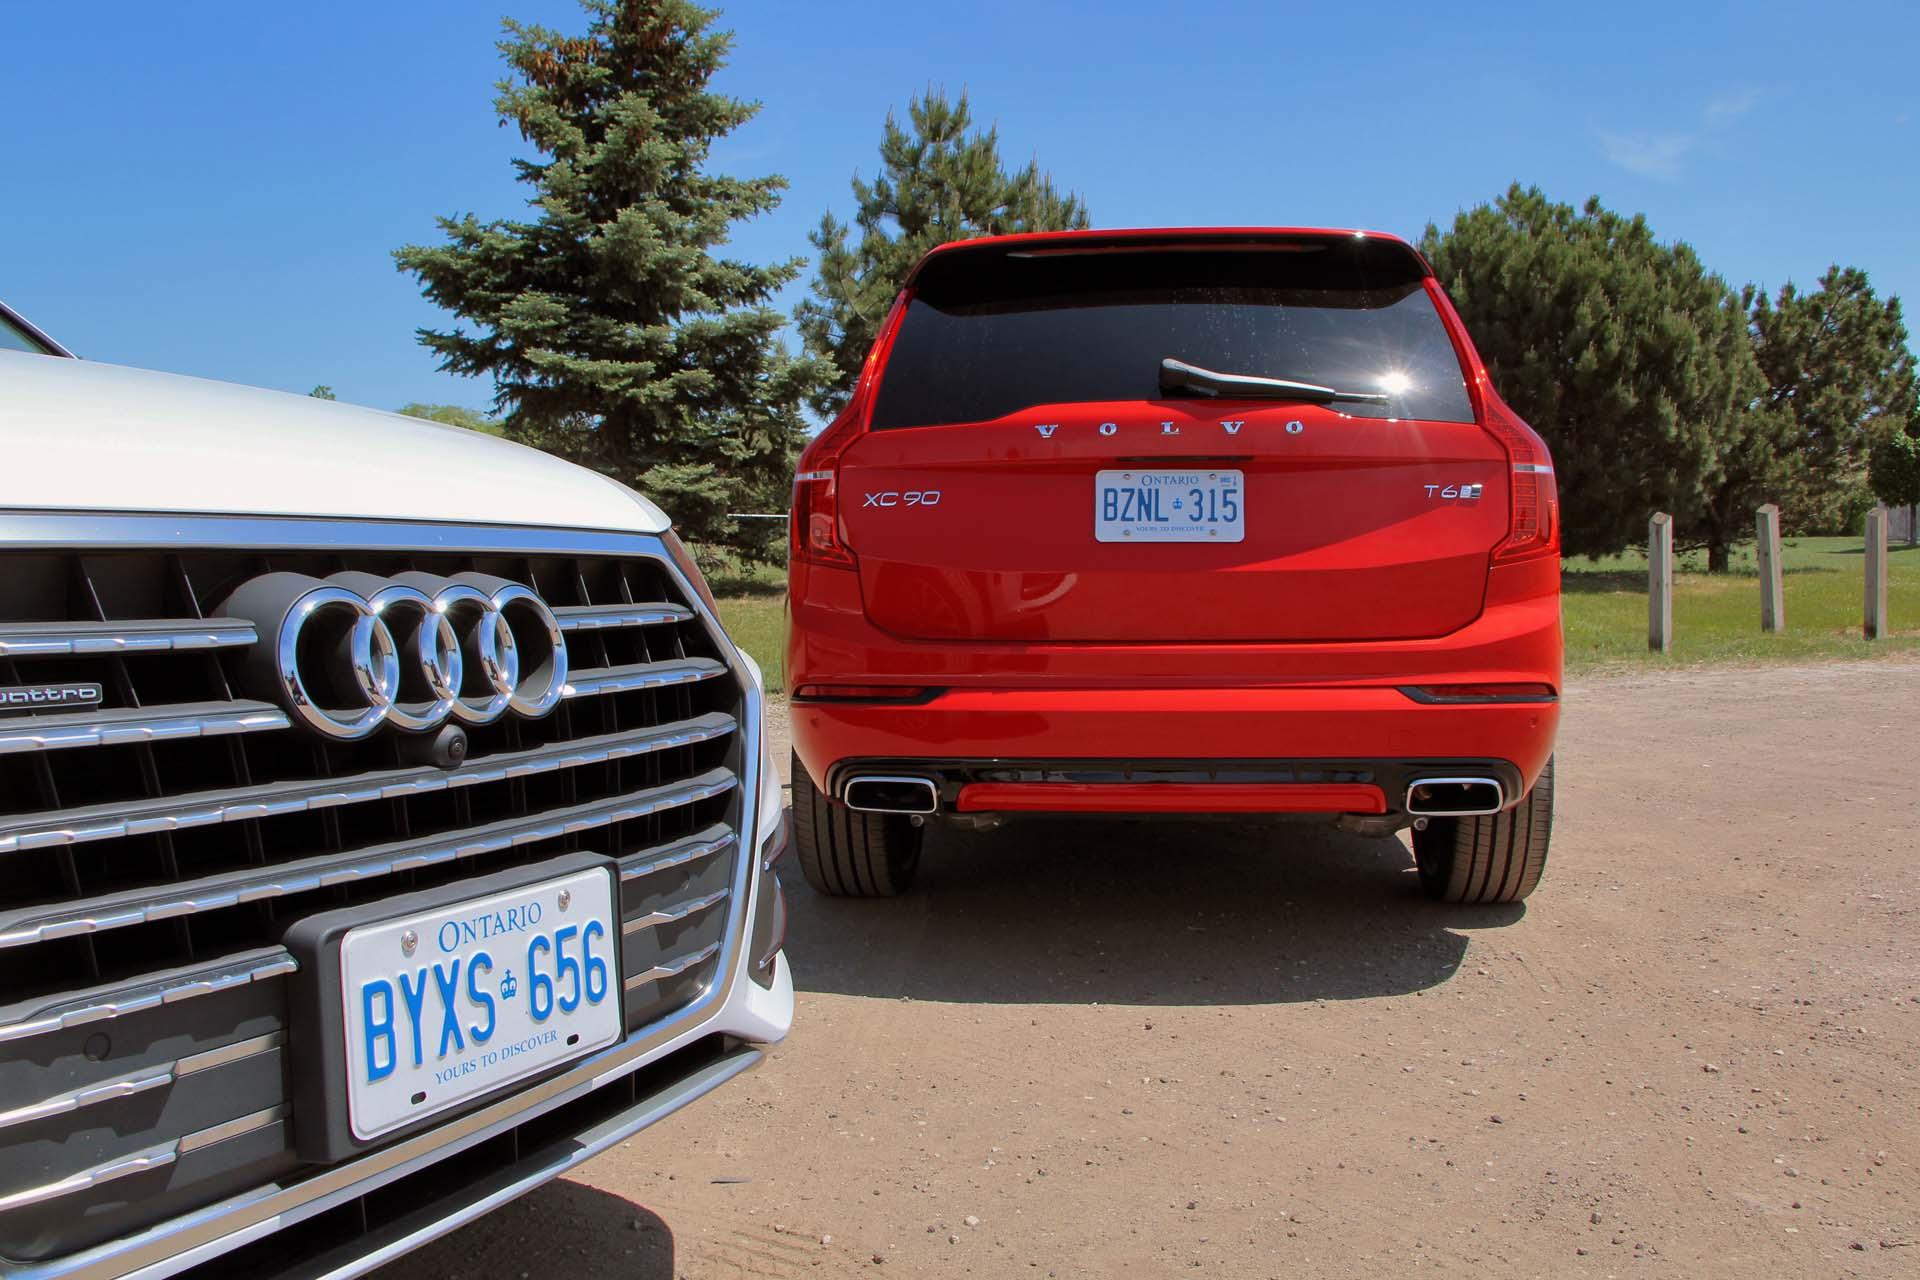 2018 Audi Q7 Vs 2017 Volvo Xc90 Compare Cars | 2017 - 2018 Cars Reviews